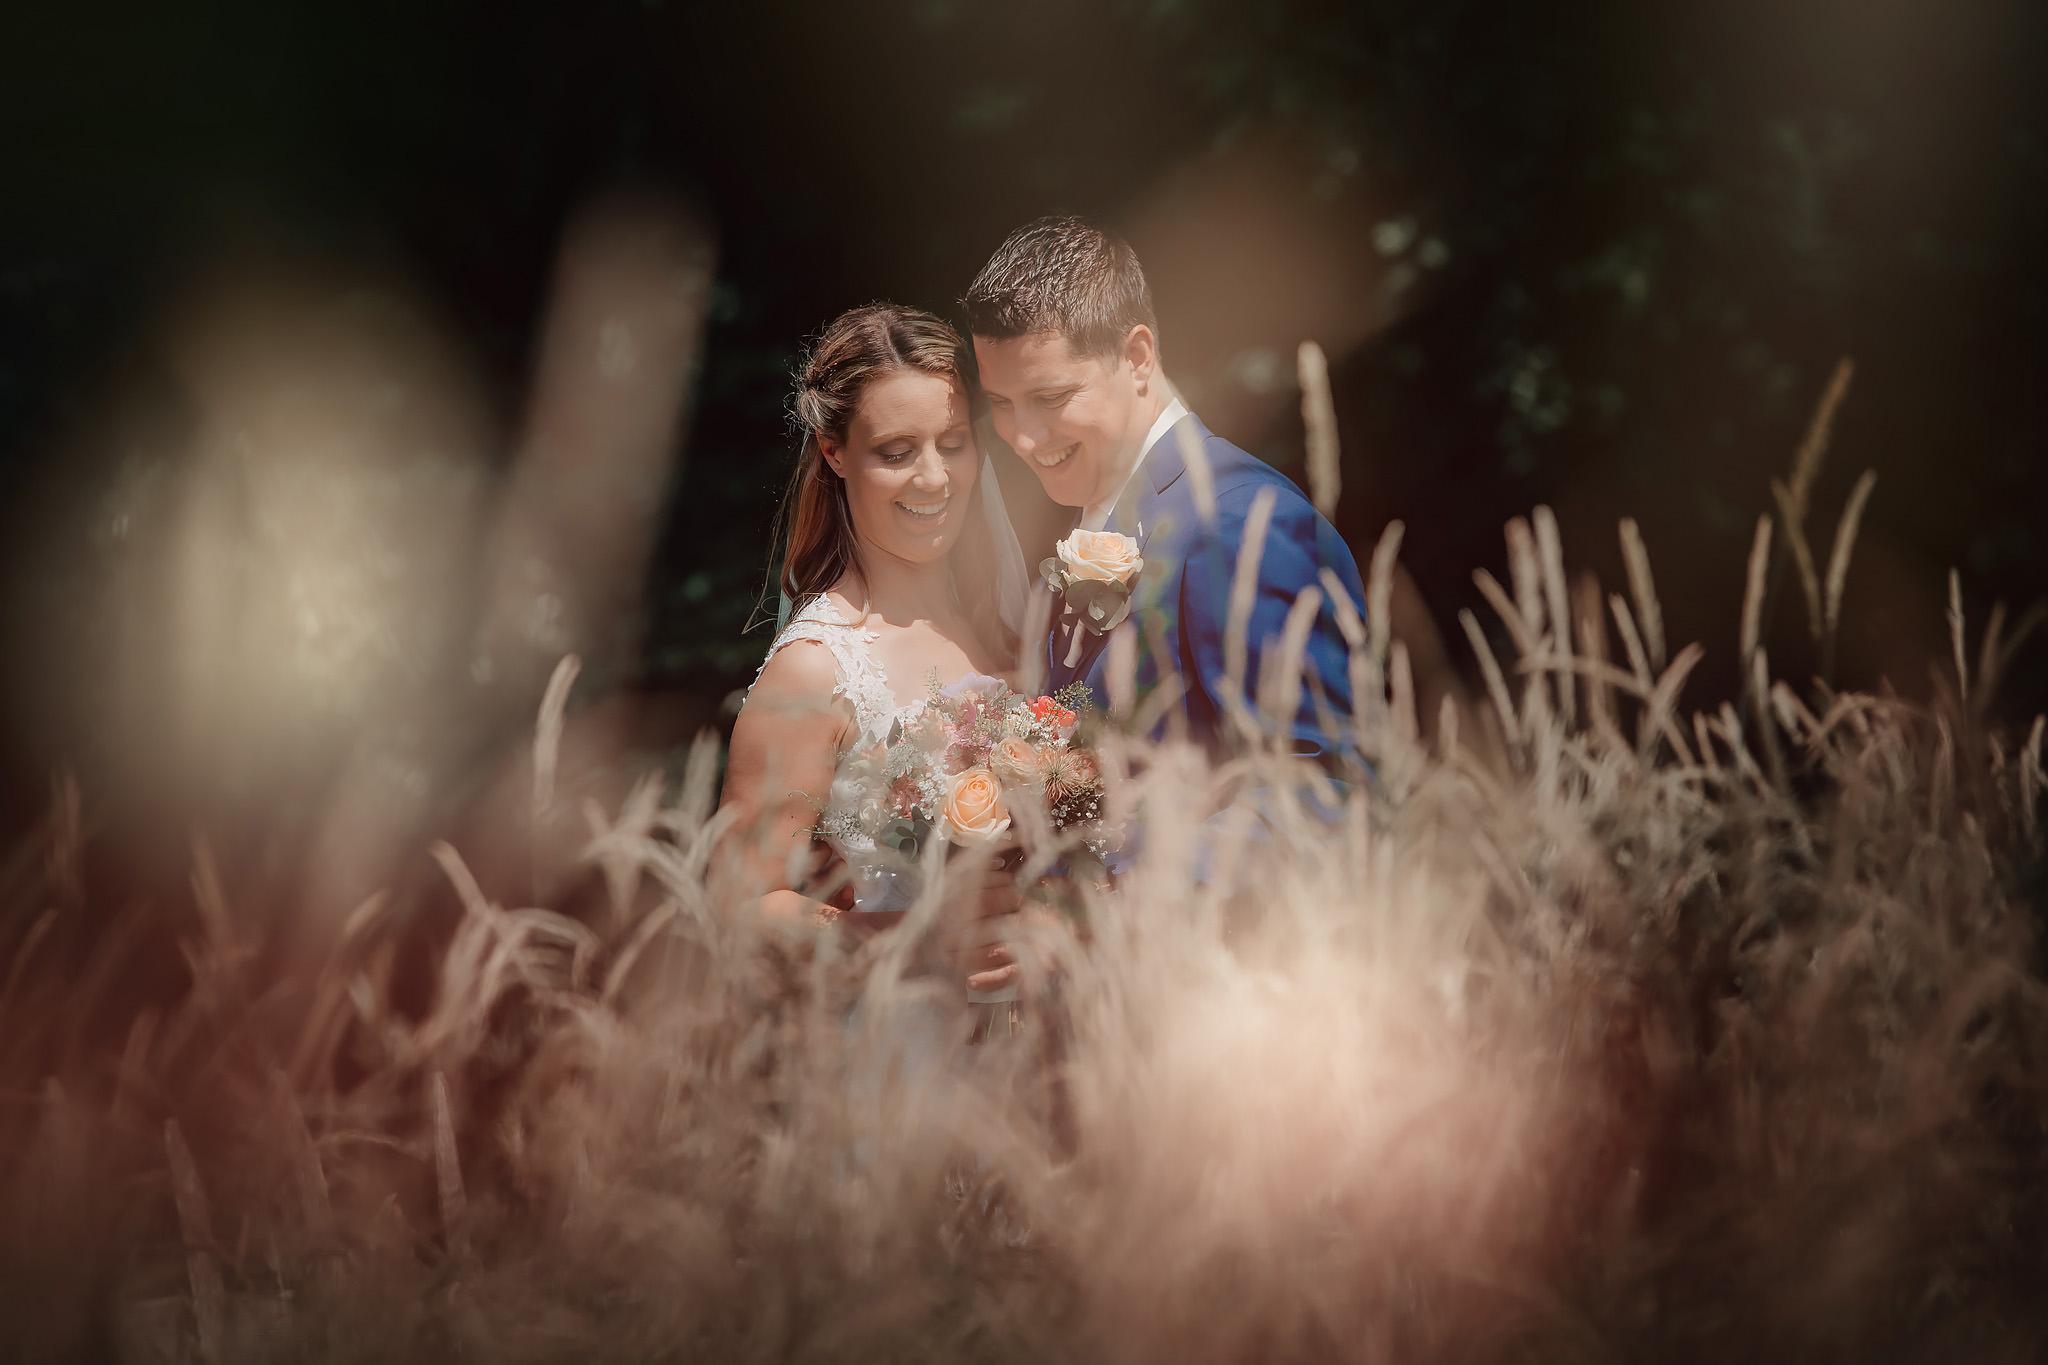 Bruidsreportage Bruidsfotografie Wedding Photographer 082 Bas Driessen Photography